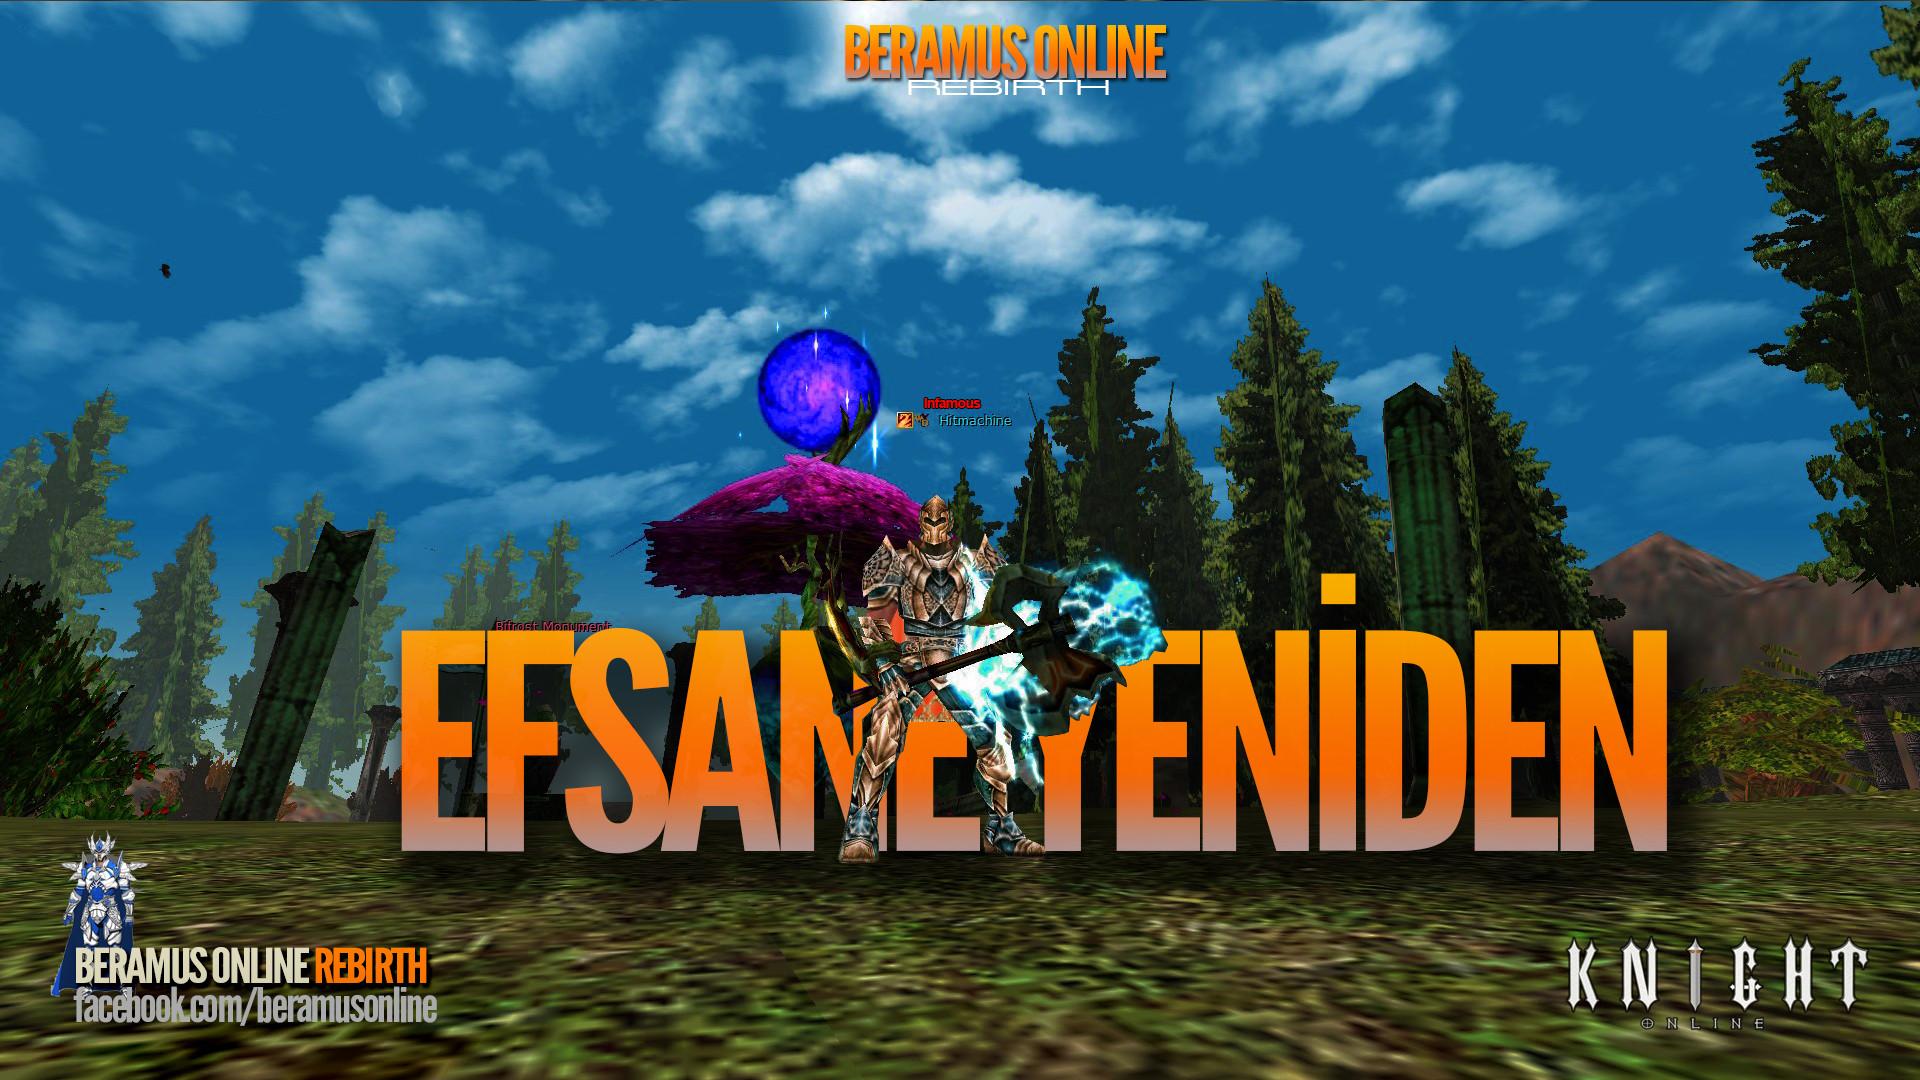 BERAMUS ONLINE REBiRTH-EFSANE YEN�DEN- v1453 FiREDRAKE